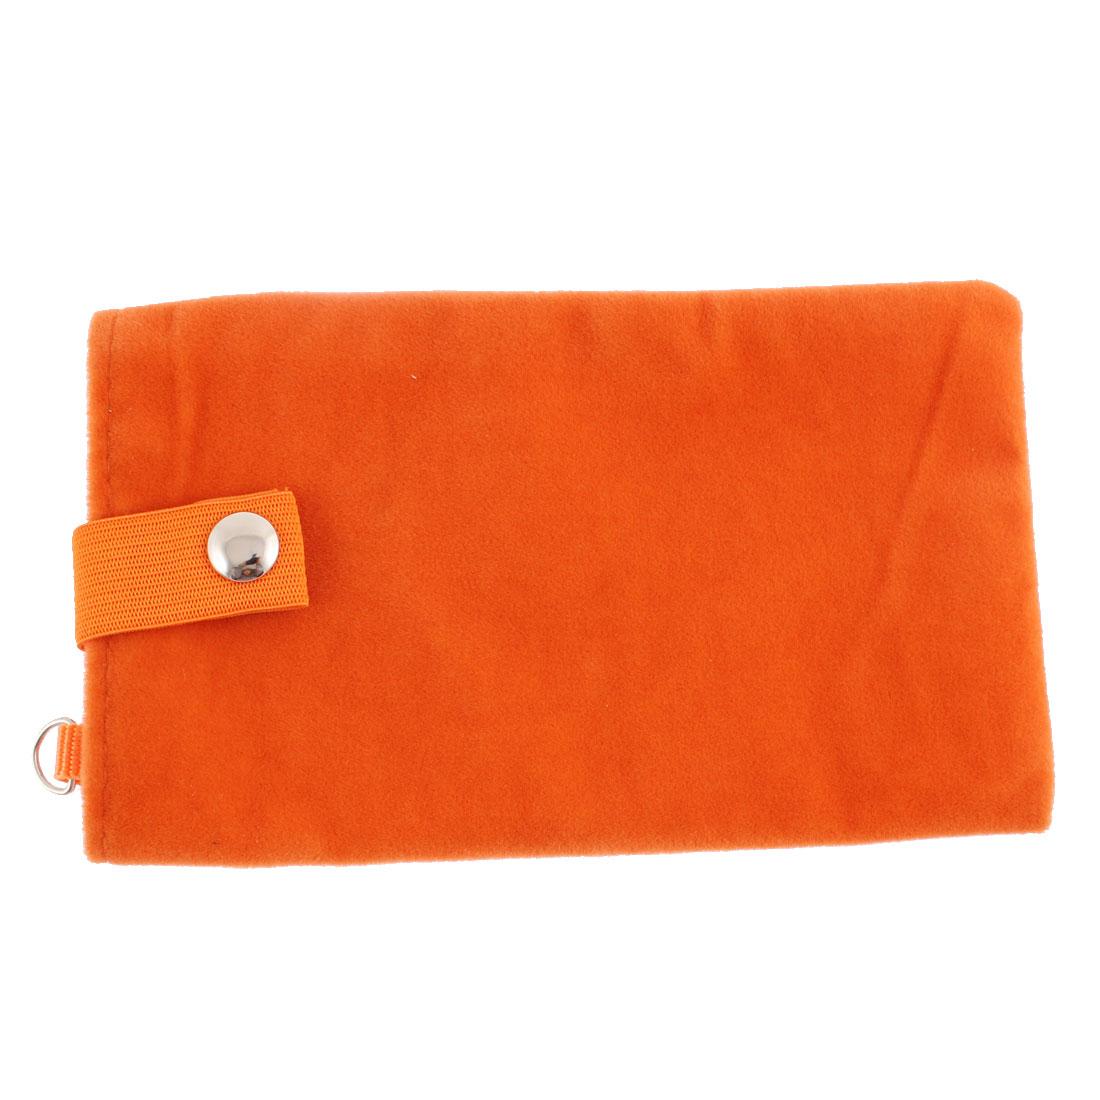 Velvet Magnetic Clasp Button Cell Phone Pouch Sleeve Bag Orange 16x9.5cm